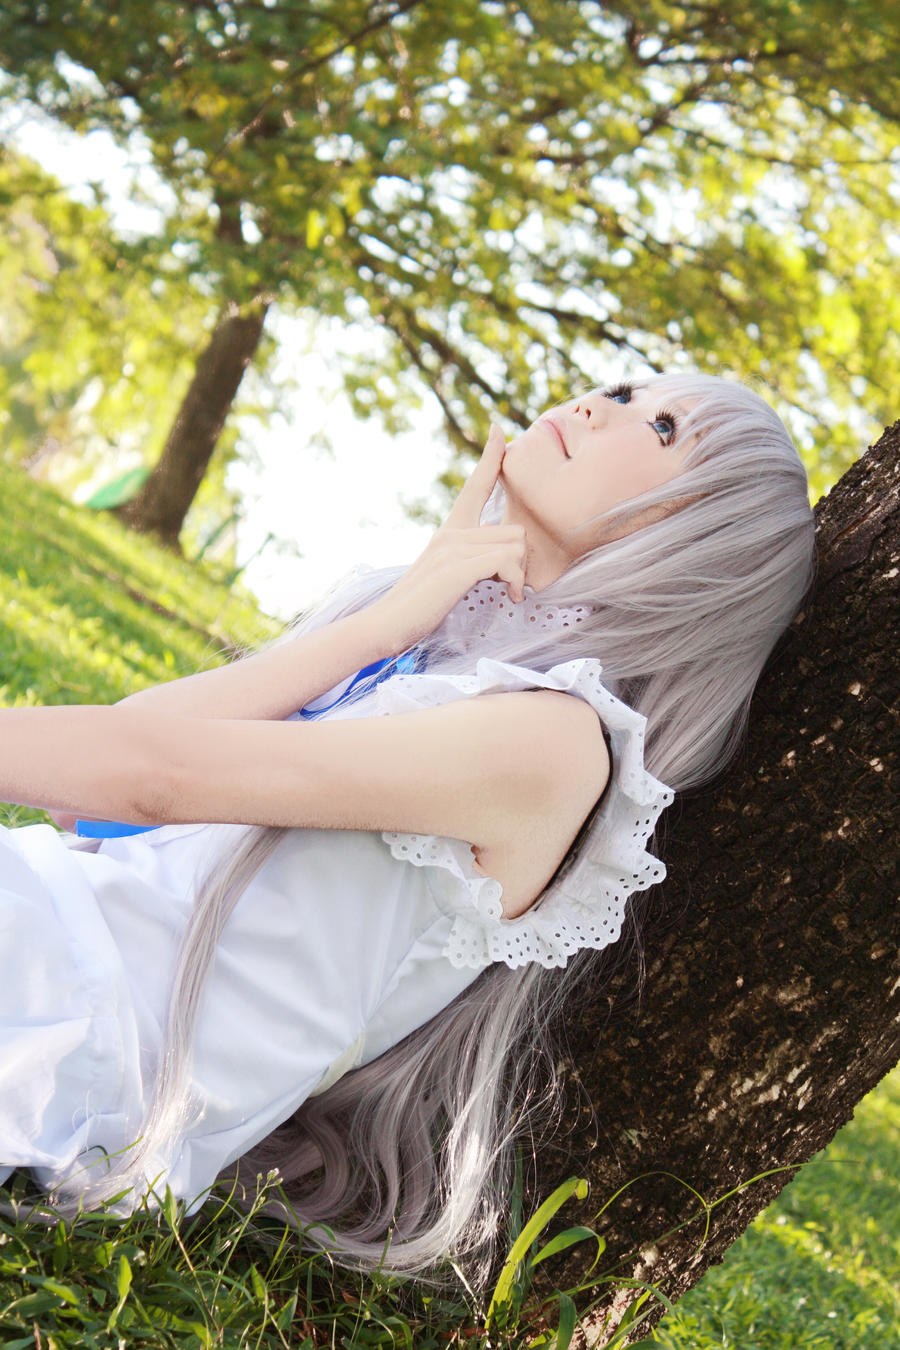 [Resim: menma_by_angie0_0-d3i09hc.jpg]